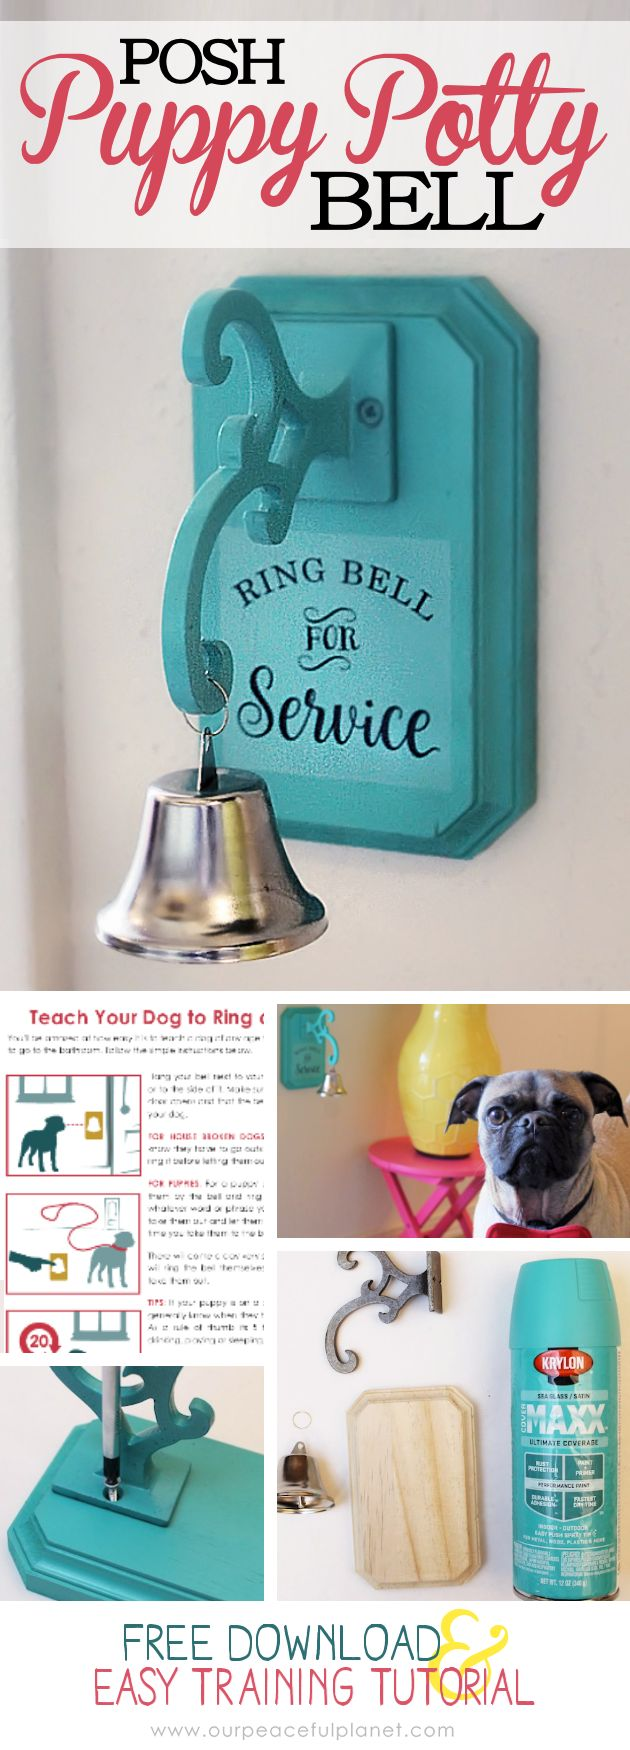 best 25+ potty training dogs ideas on pinterest | potty training